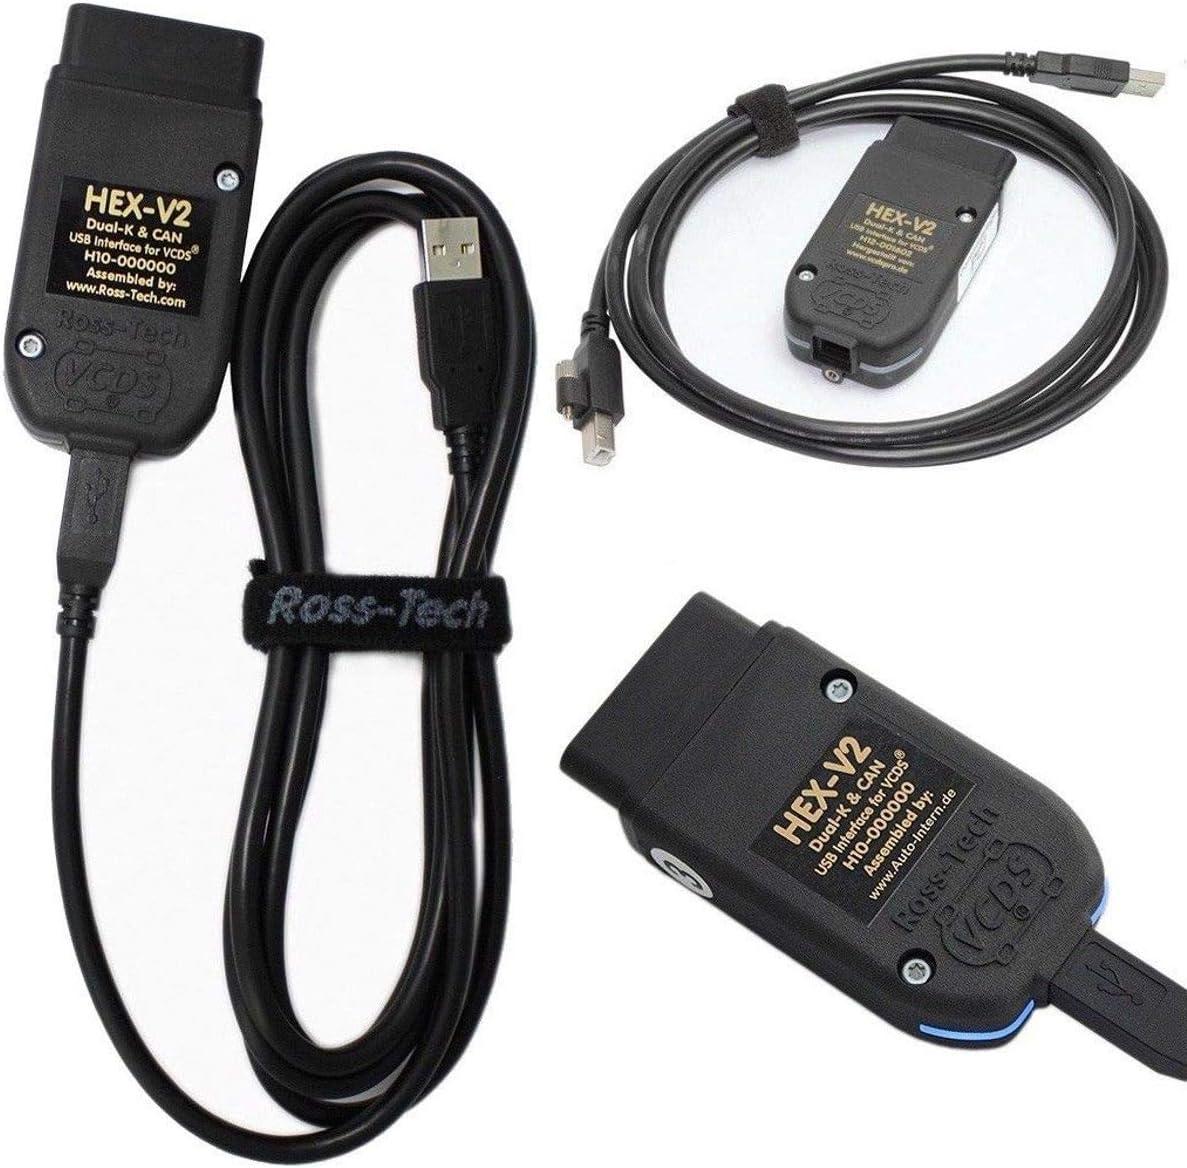 Auto OBD2 Diagnoseger/ät Diagnostic System 19.62 HEX USB-CAN-Schnittstelle Auto-Diagnosewerkzeuge OBD-II Diagnosescannerkabel